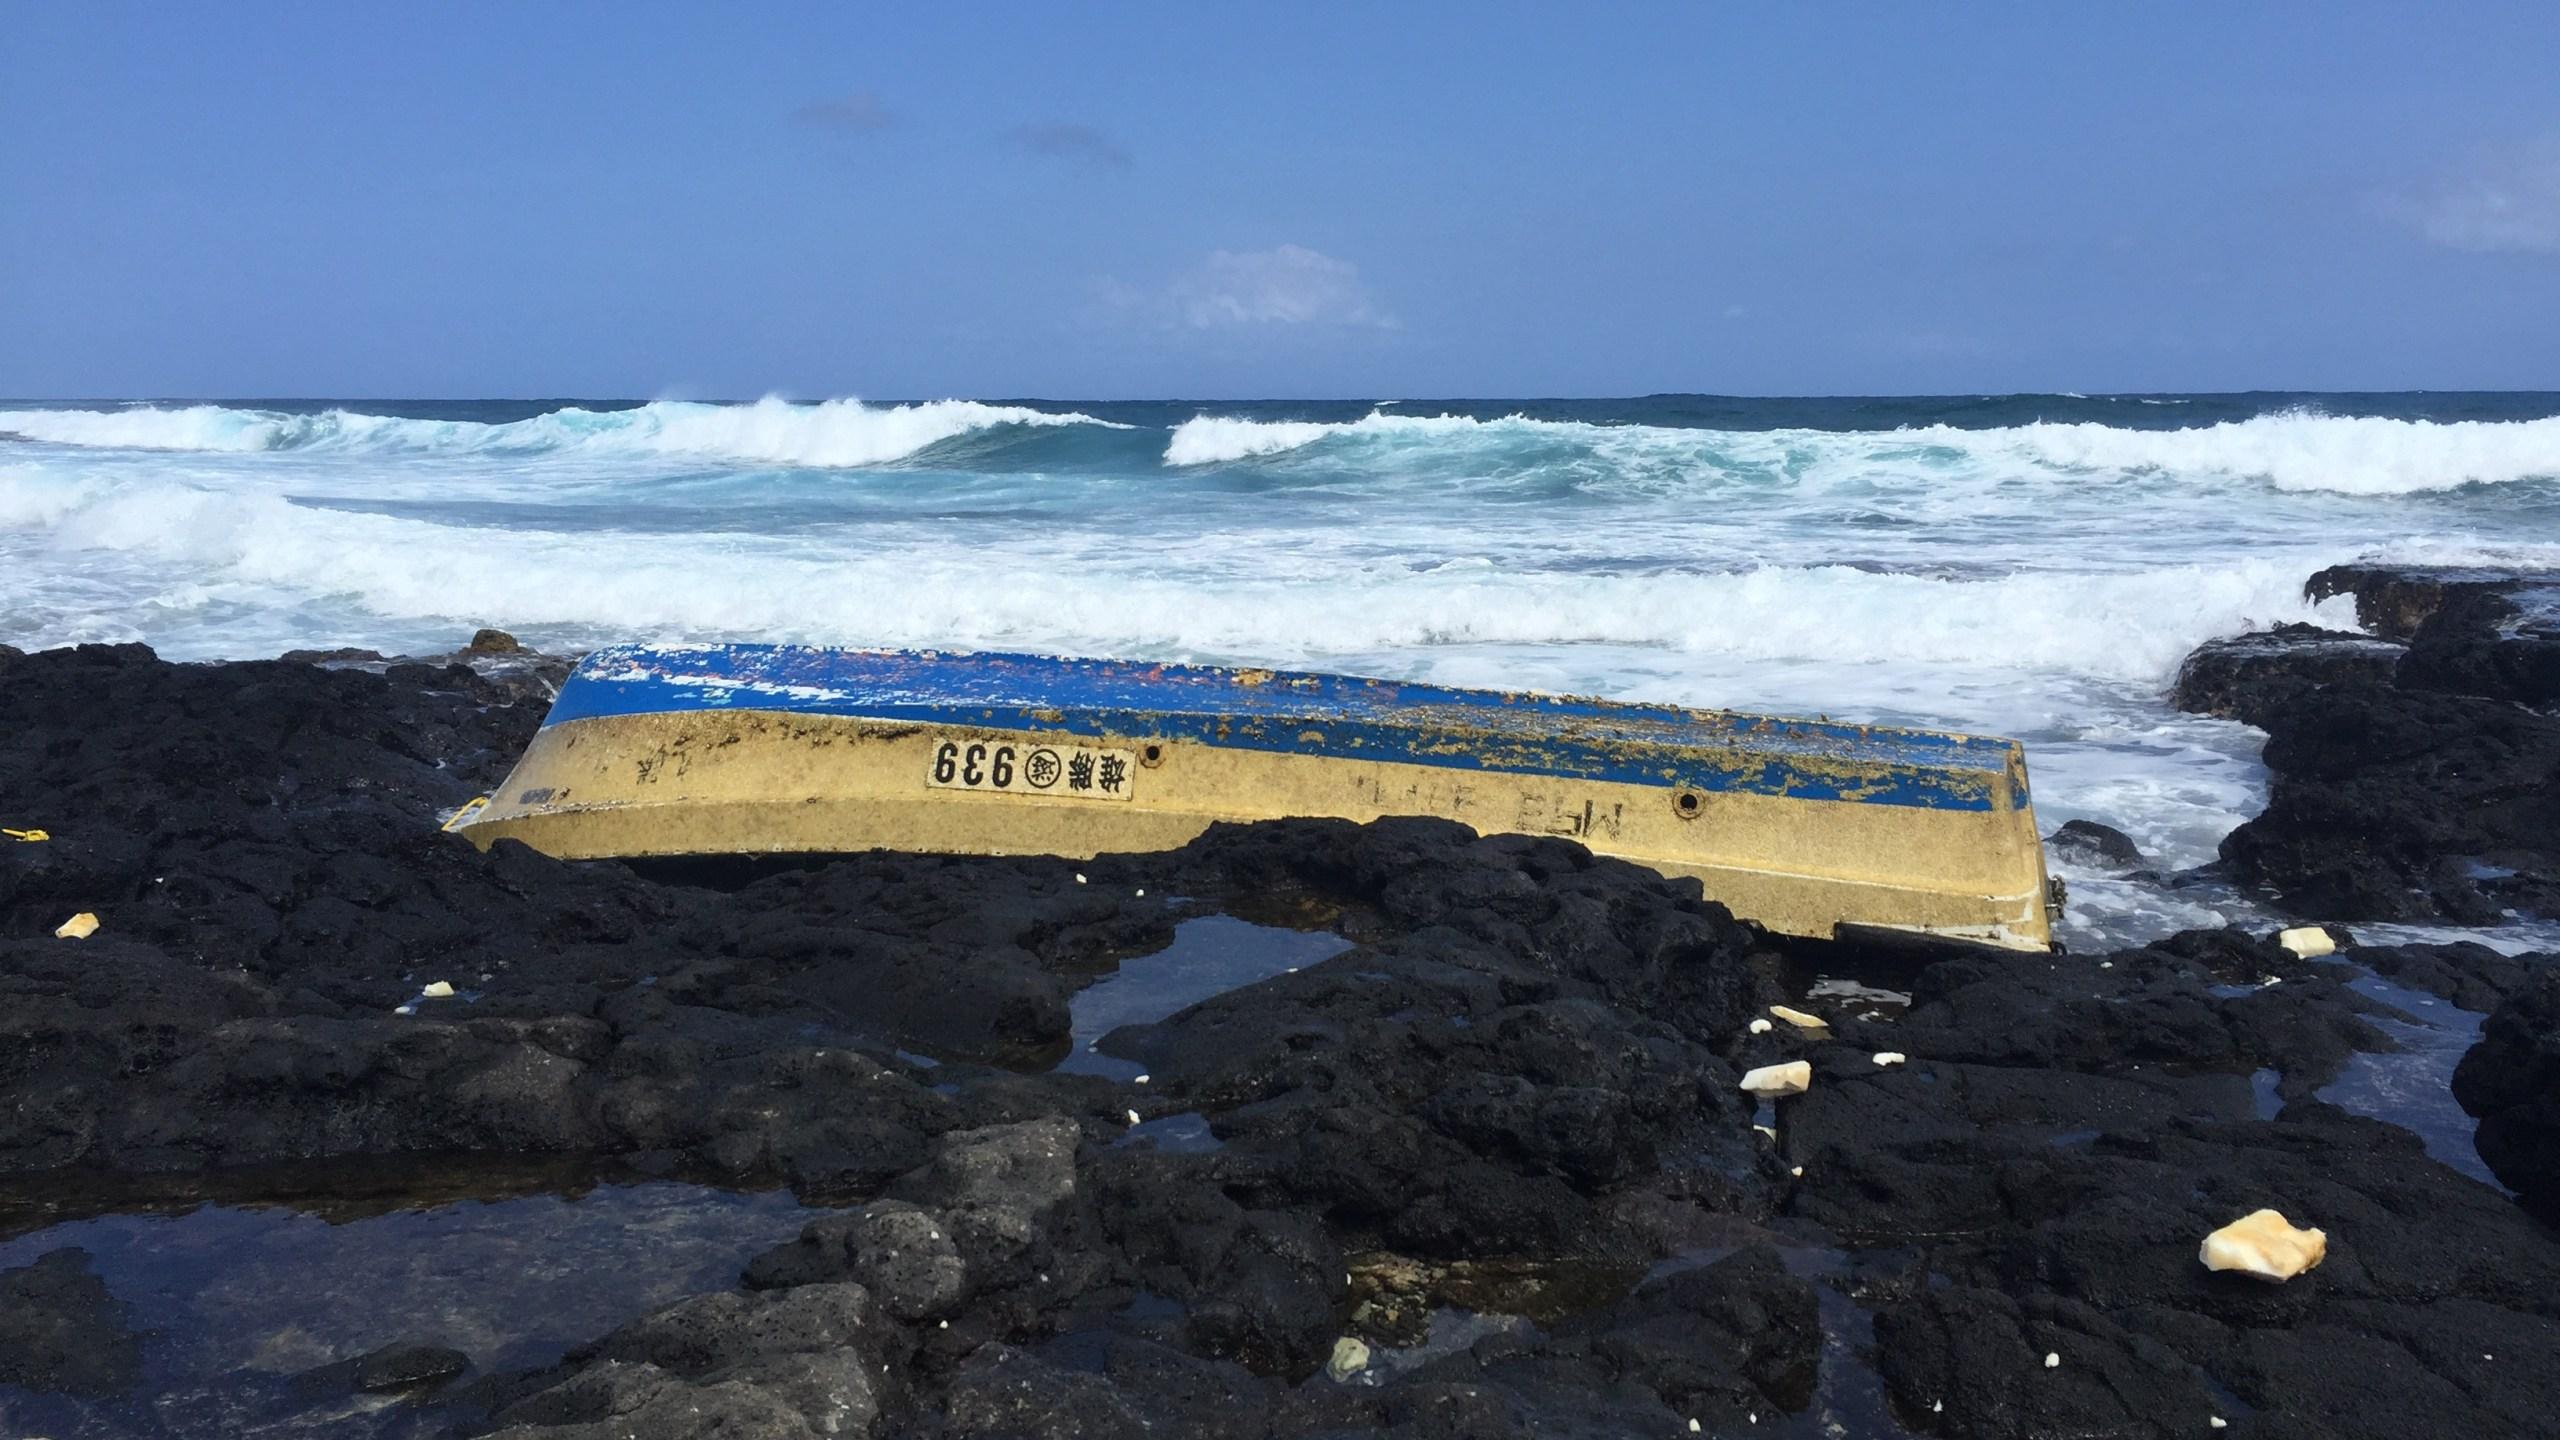 japanese tsunami debris boat_90444